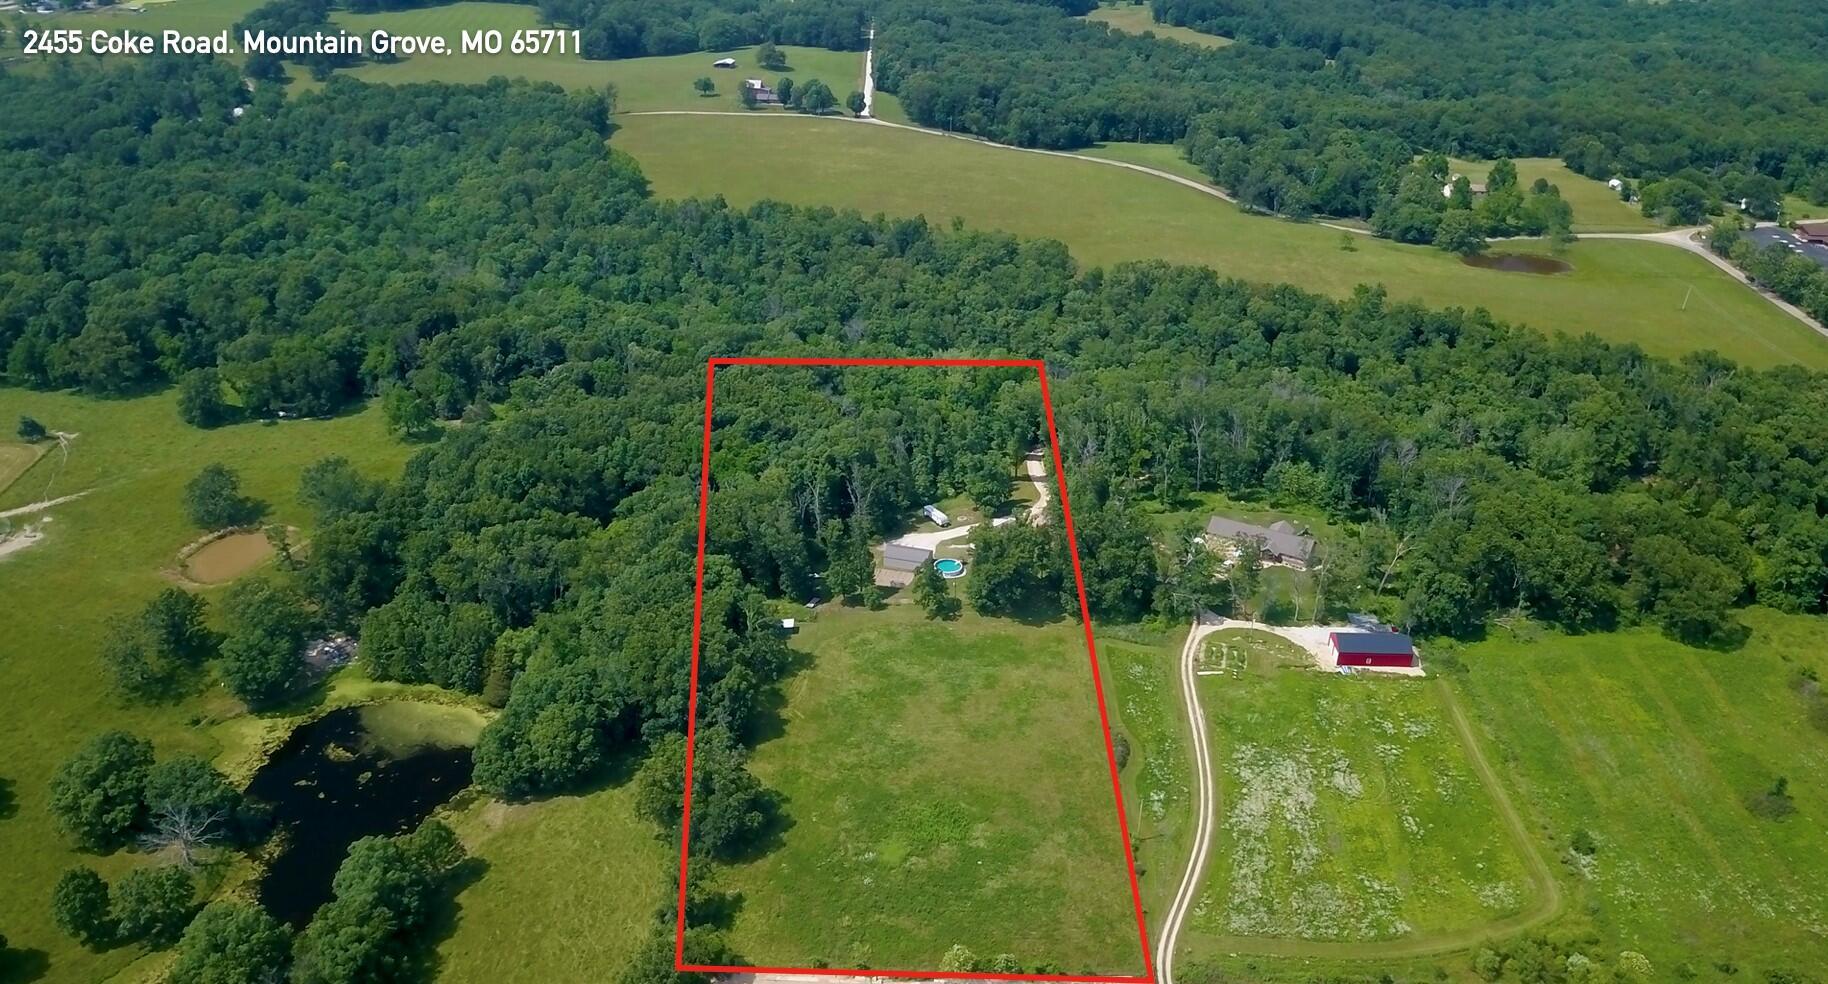 Property for sale at 2455 Coke, Mountain Grove,  Missouri 65711